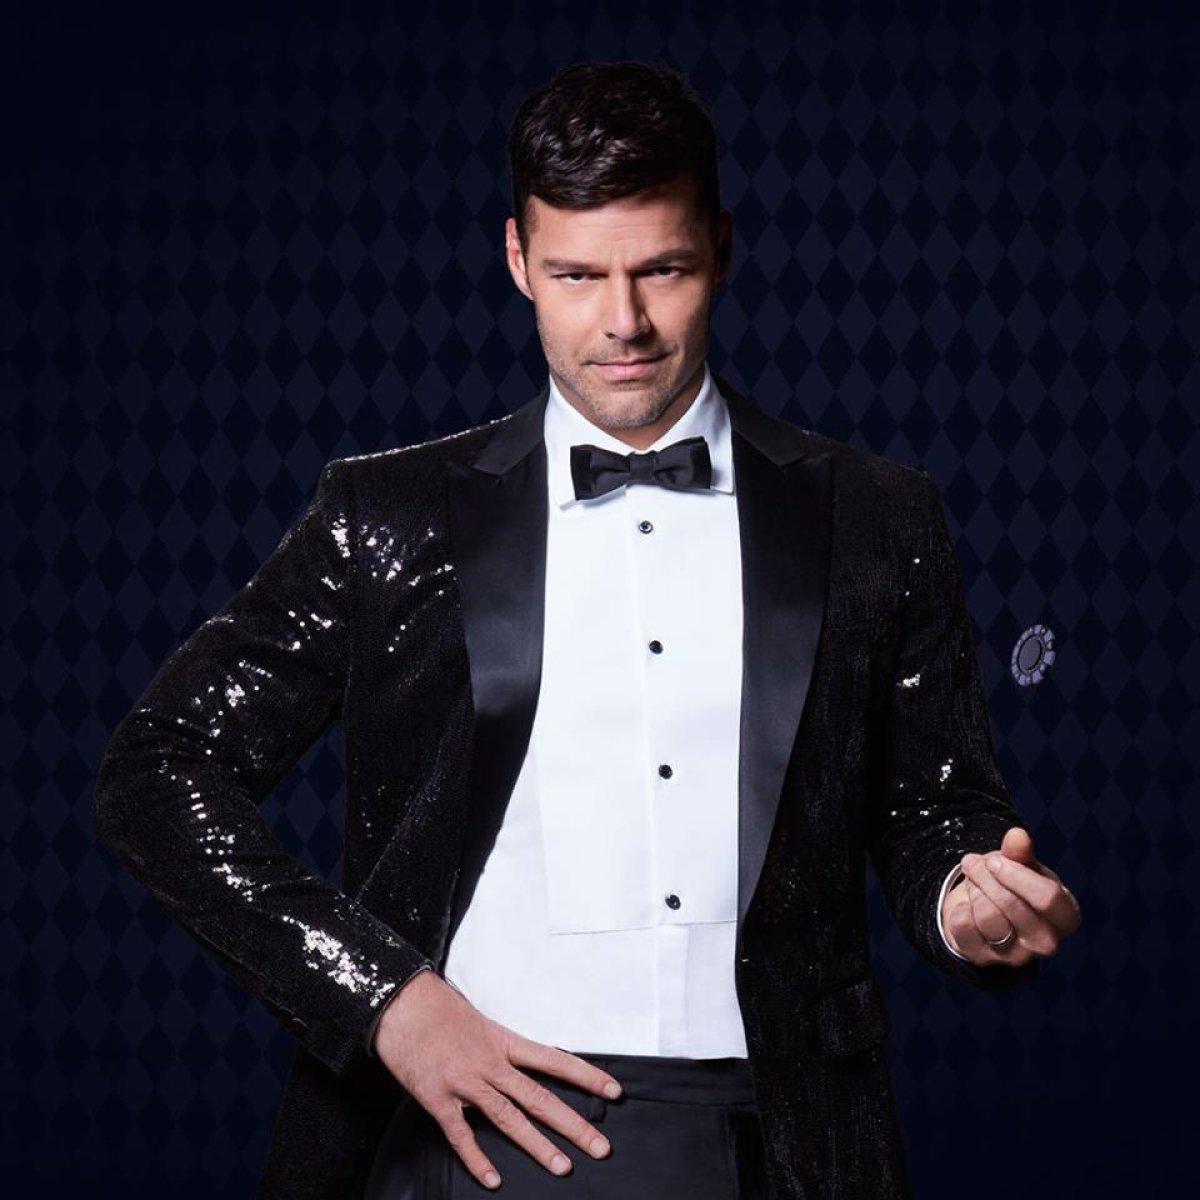 La boda de Ricky Martin está cada vez más cerca